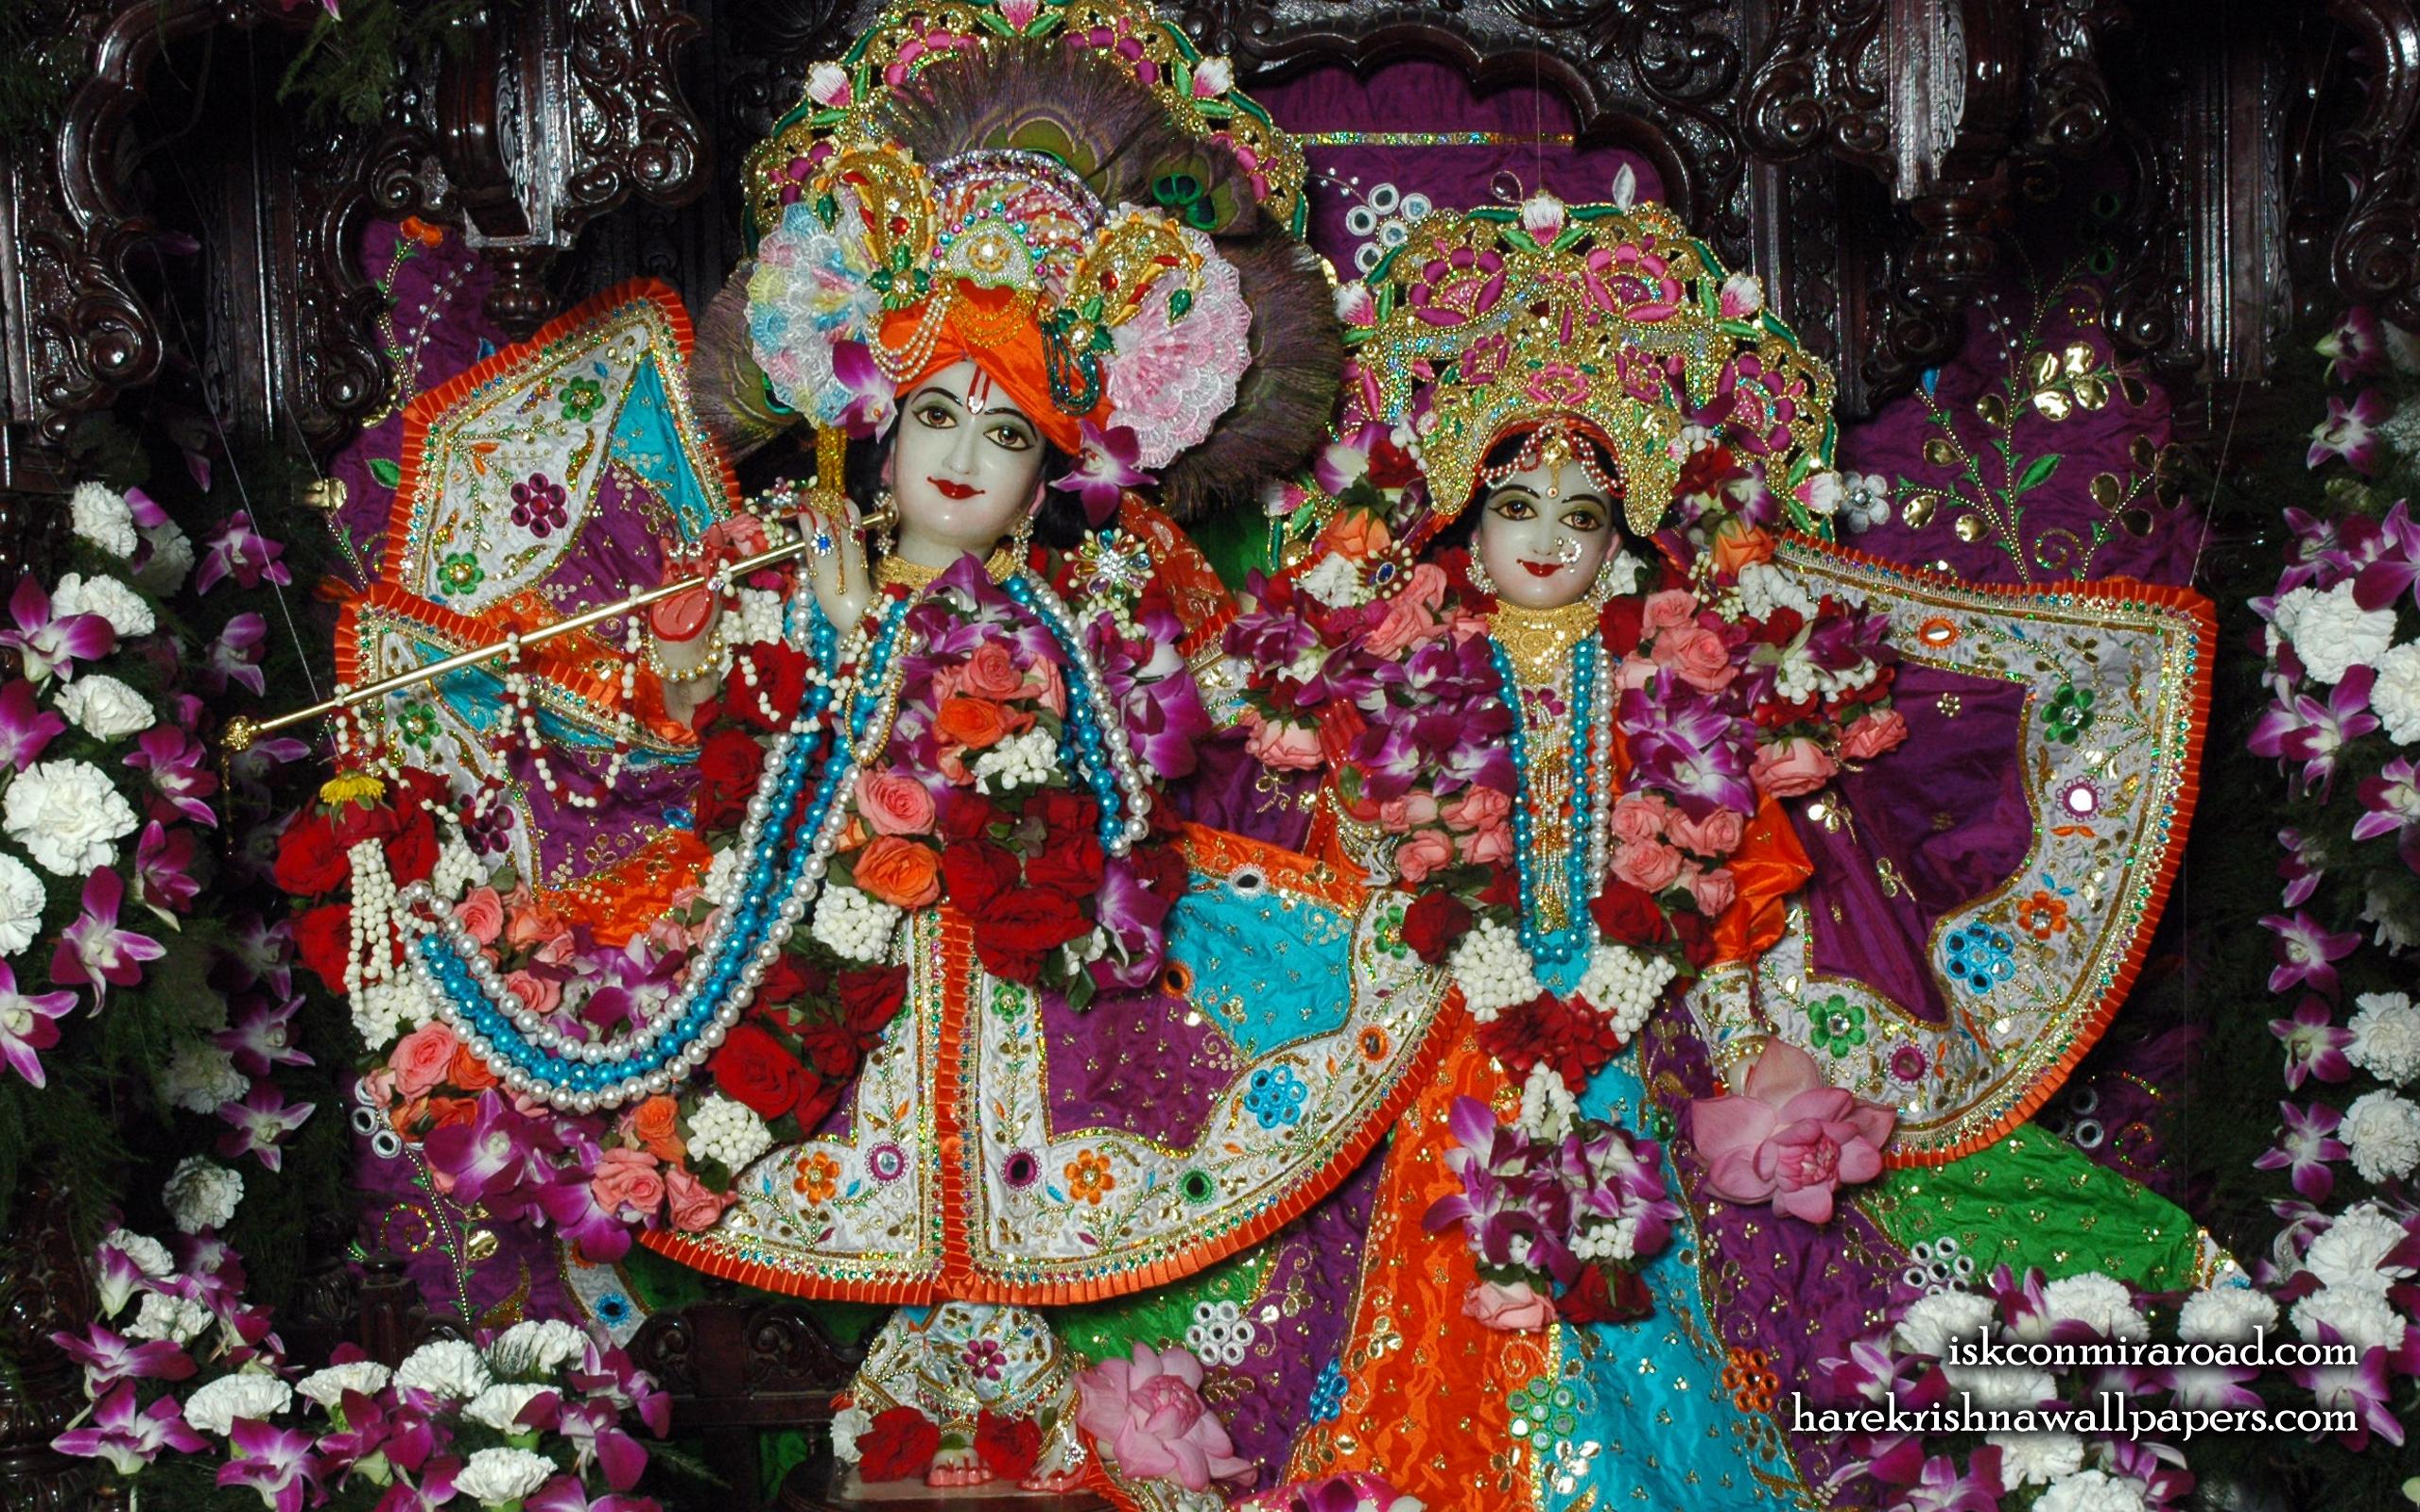 Sri Sri Radha Giridhari Wallpaper (016) Size 2560x1600 Download